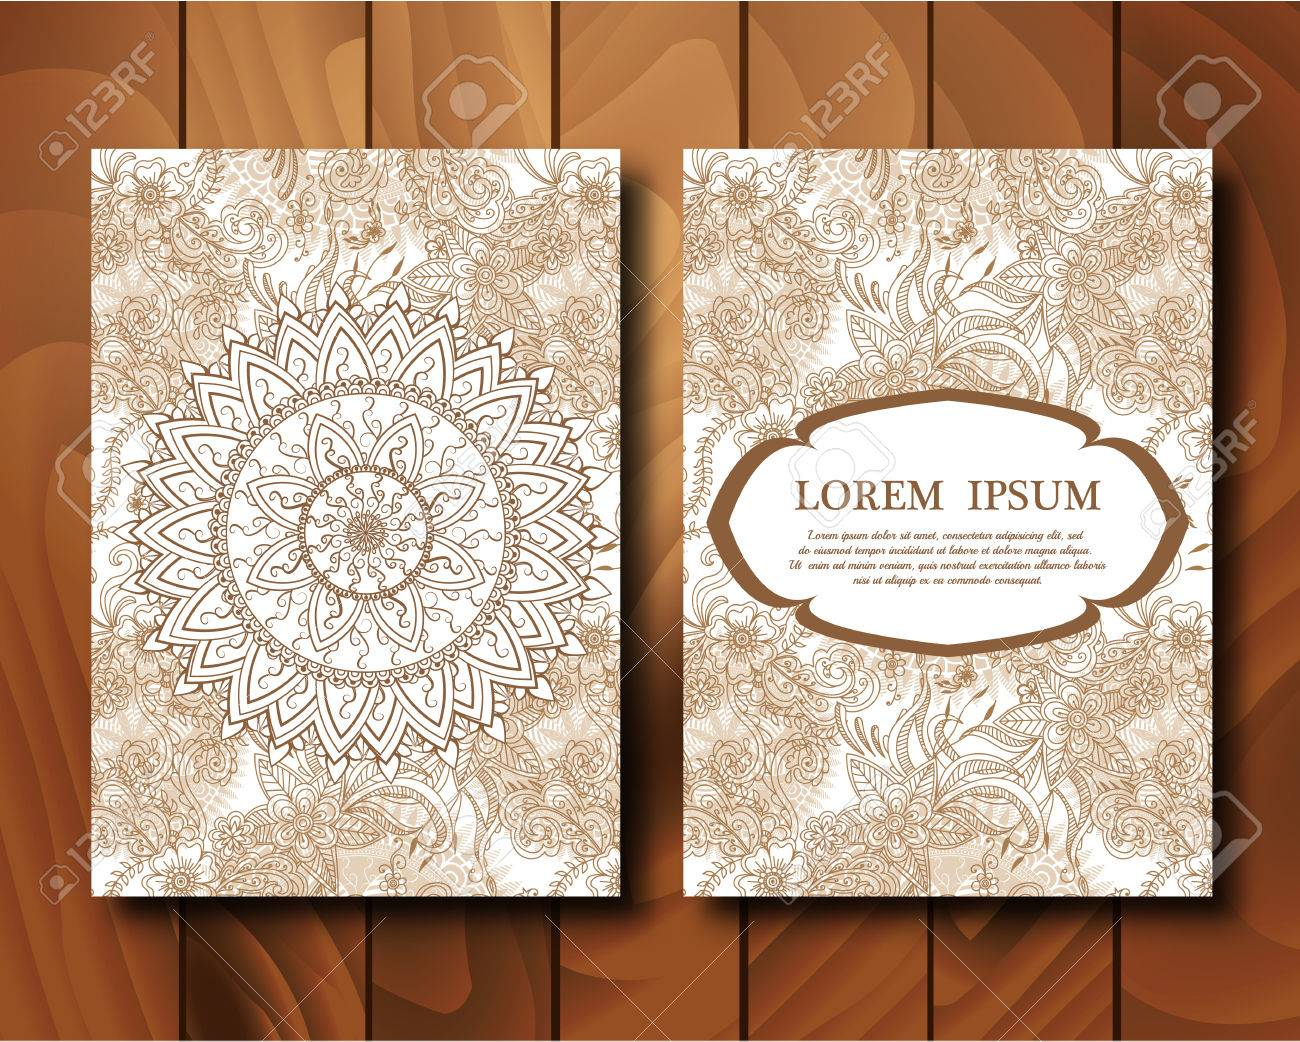 Henna Mehndi Vector : Vector vintage cards in mehndi style. invitation with